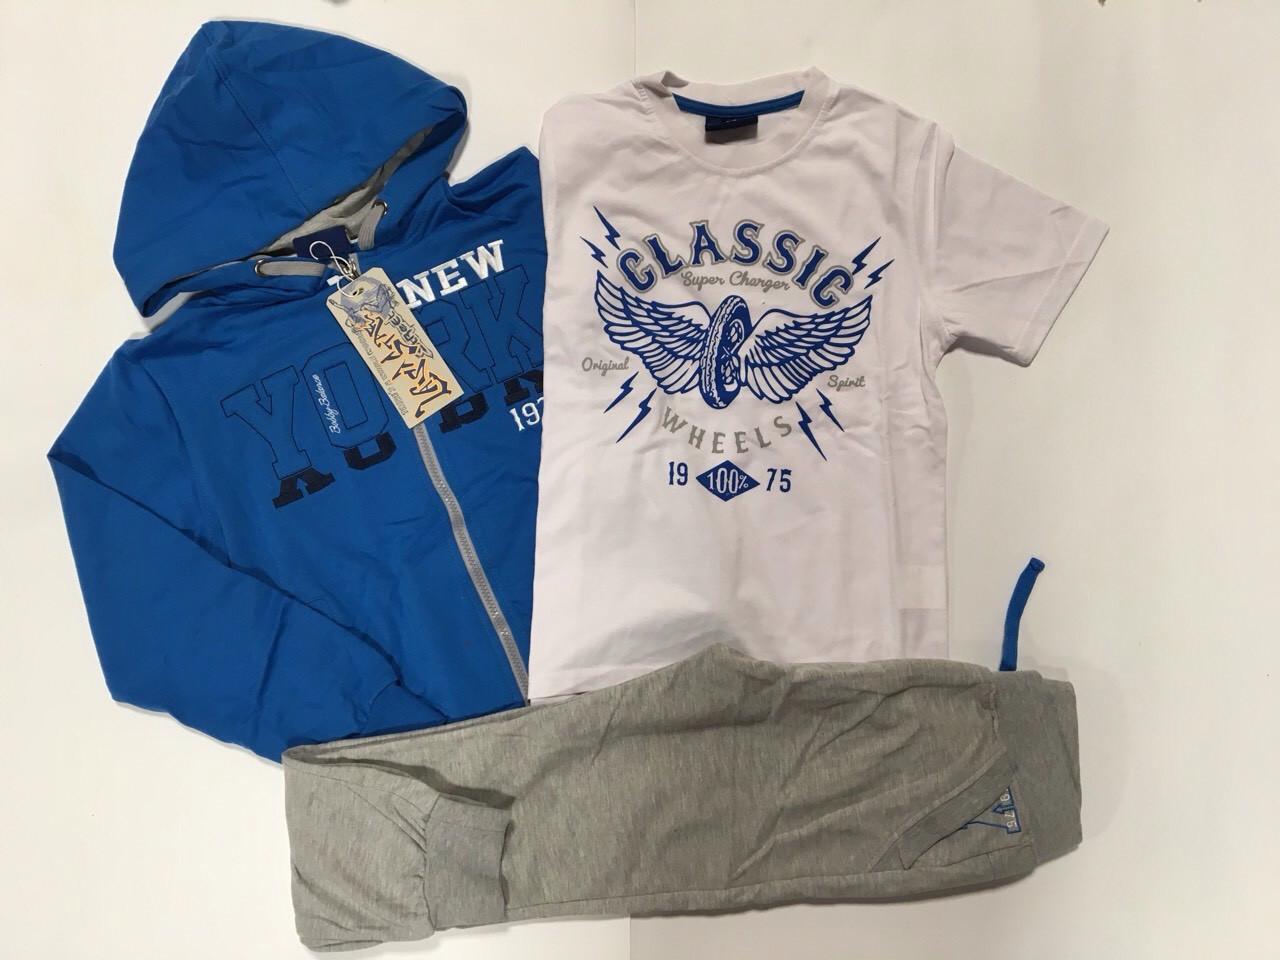 Спортивный костюм тройка для мальчика Last Star размер 9/10-15/16